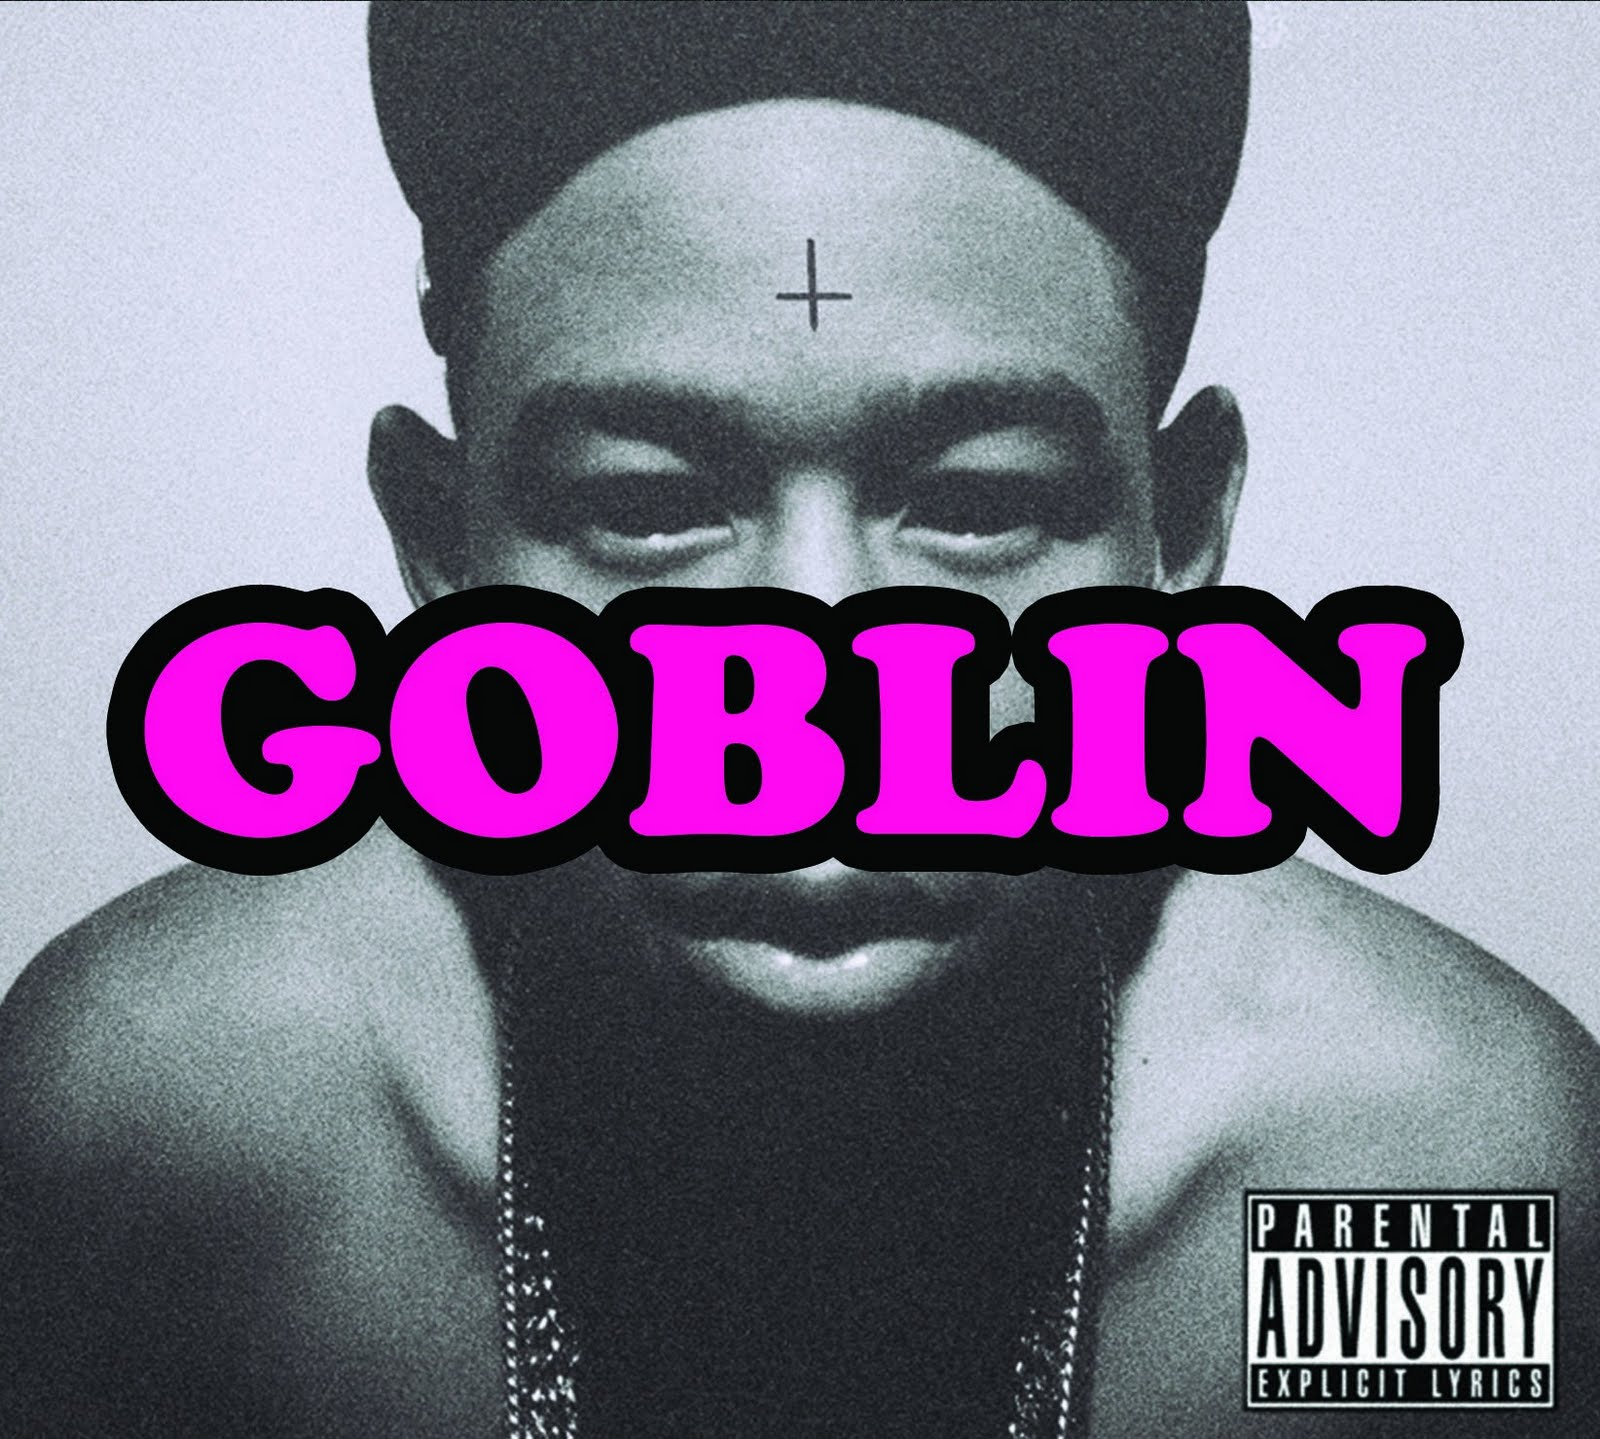 miami highlife u2122  tyler the creator u0026 39 s goblin album drops